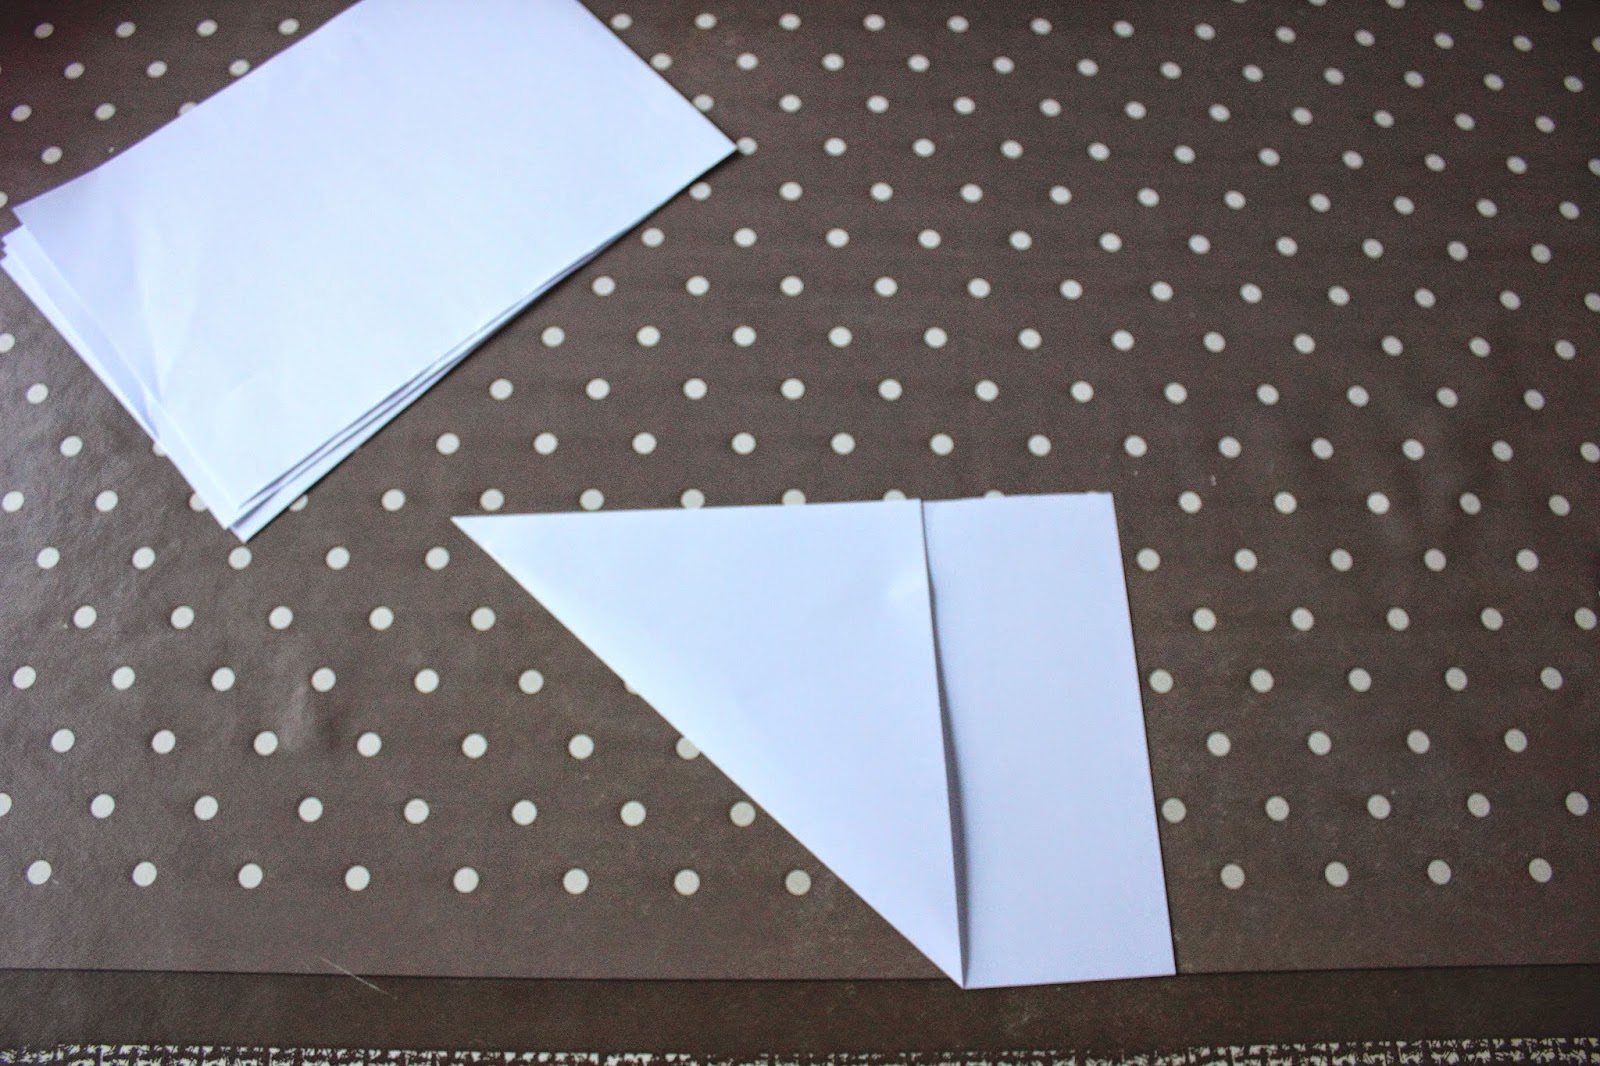 coquillette coquette diy de noel 1 un joli flocon de neige en 3d en papier. Black Bedroom Furniture Sets. Home Design Ideas